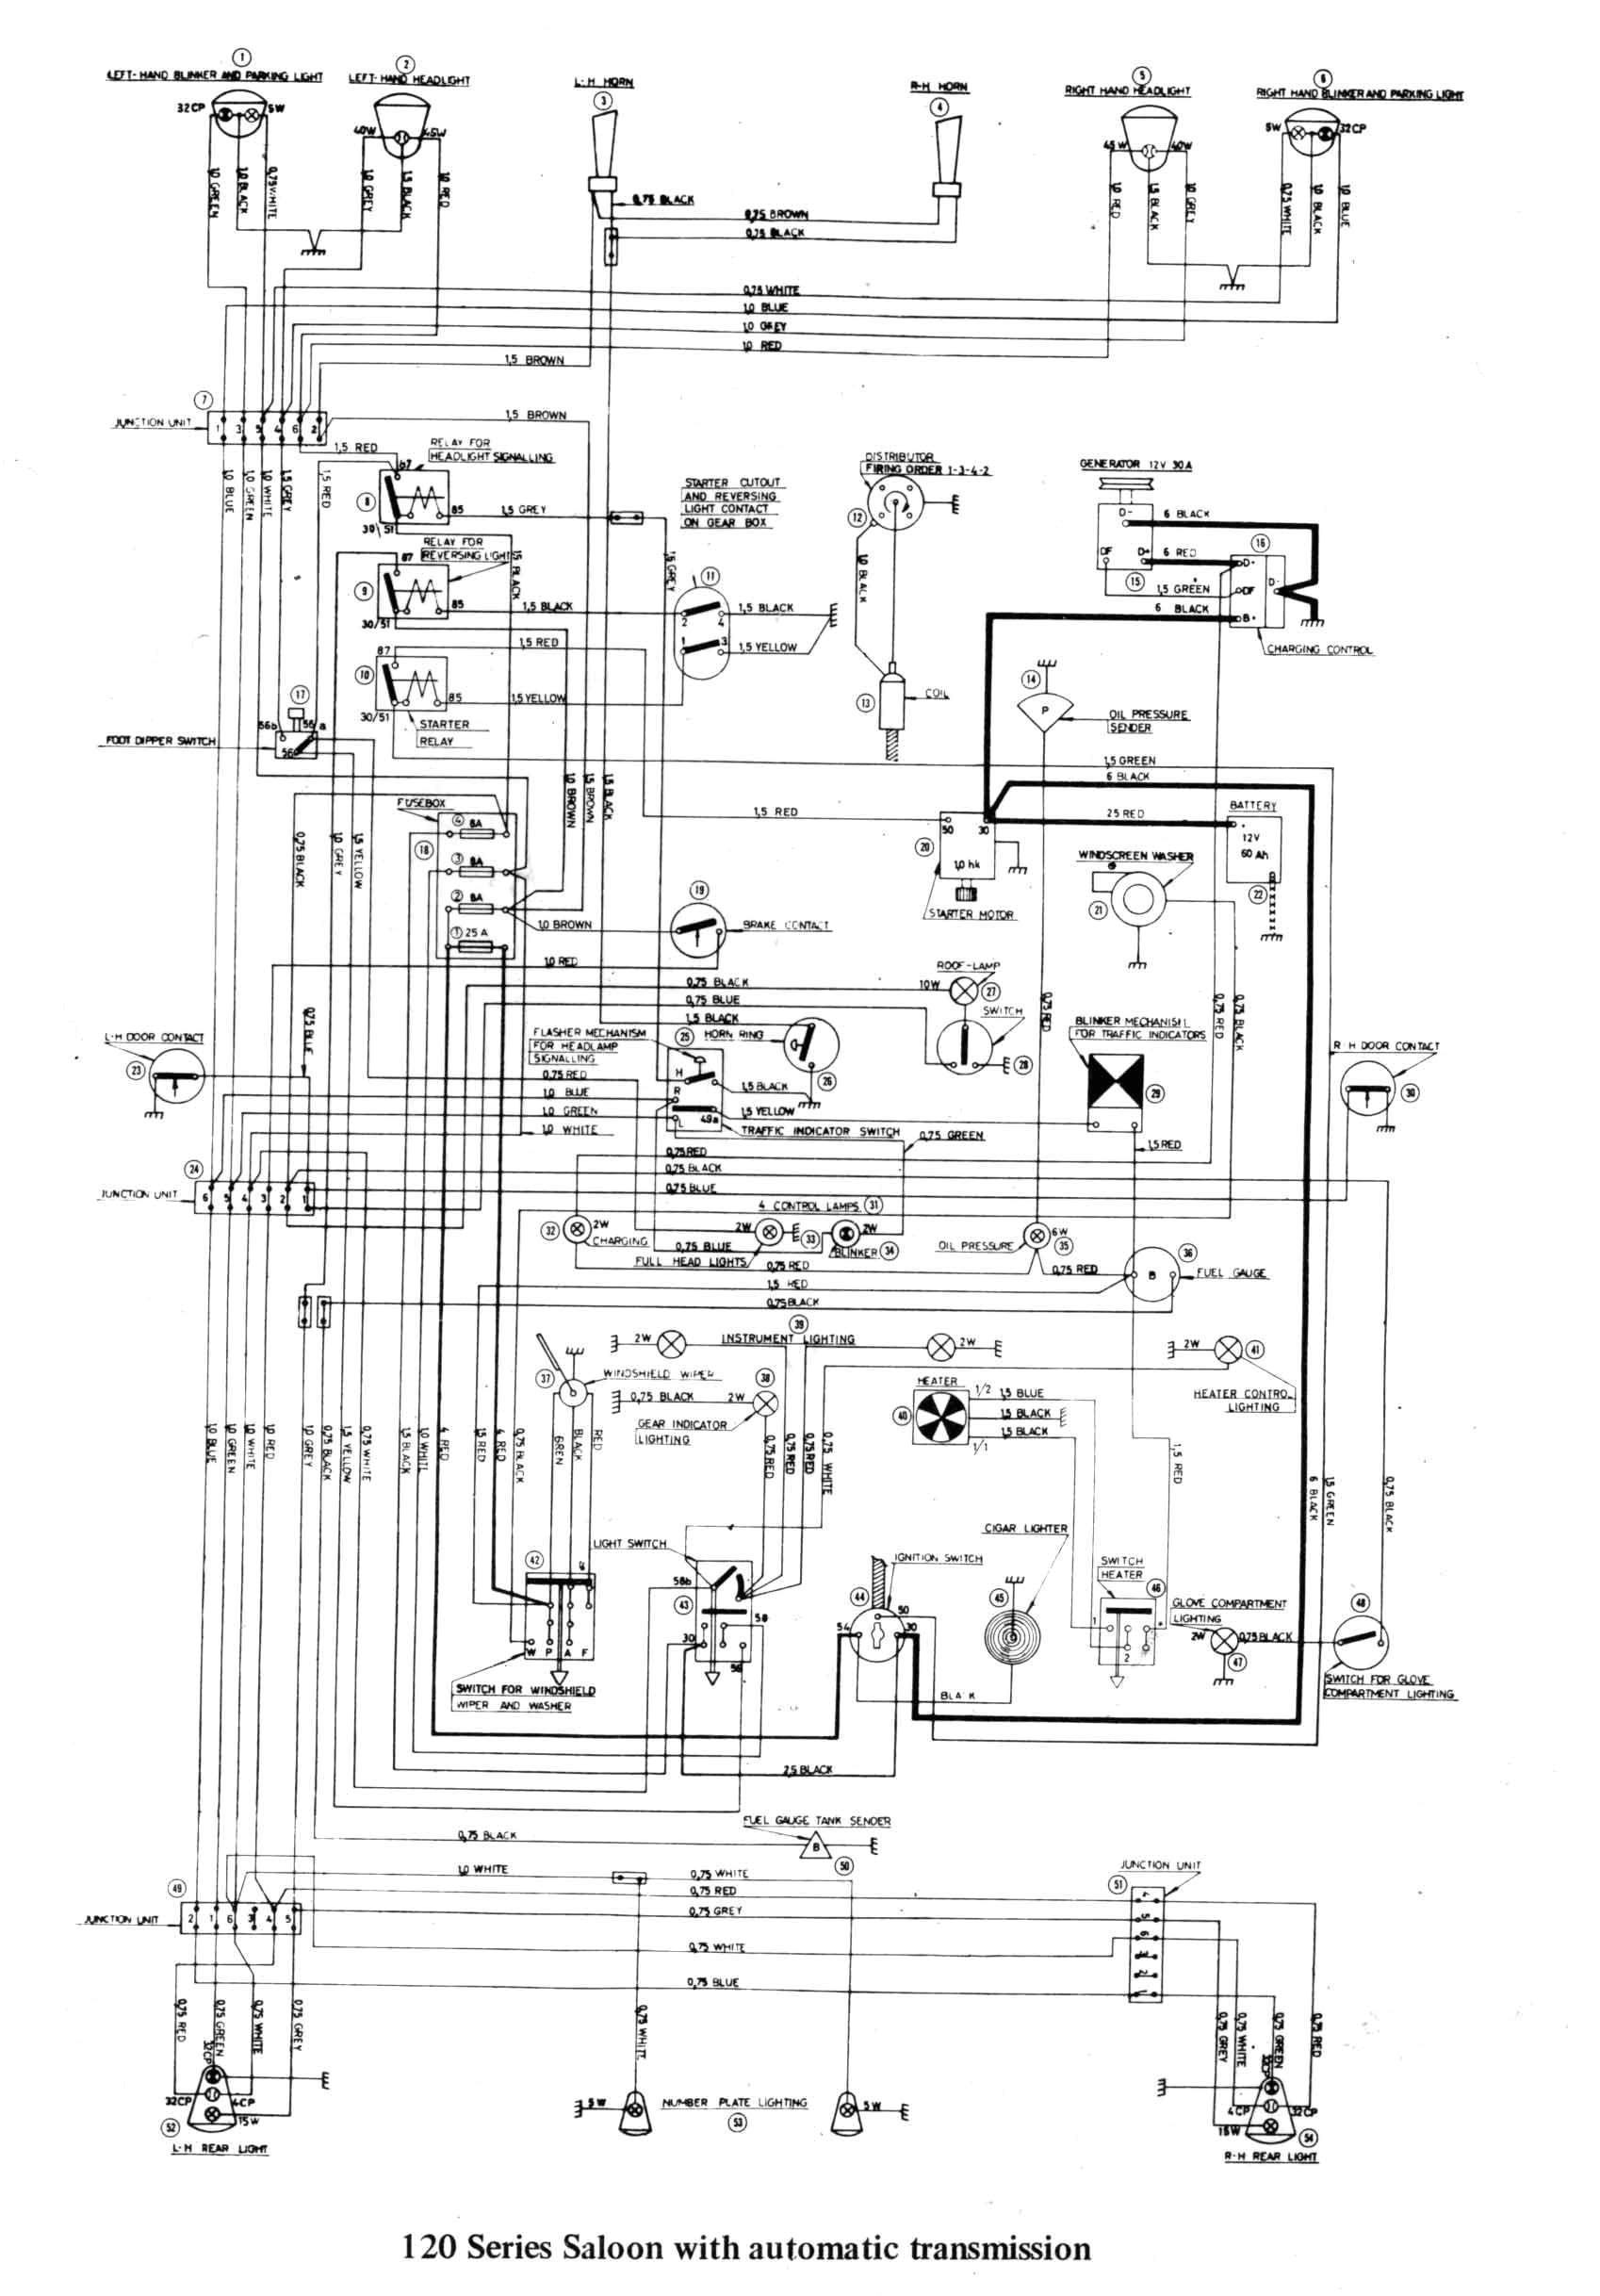 man truck electrical wiring diagram sw em od retrofitting vintage volvo refer wiring diagram 122s showy